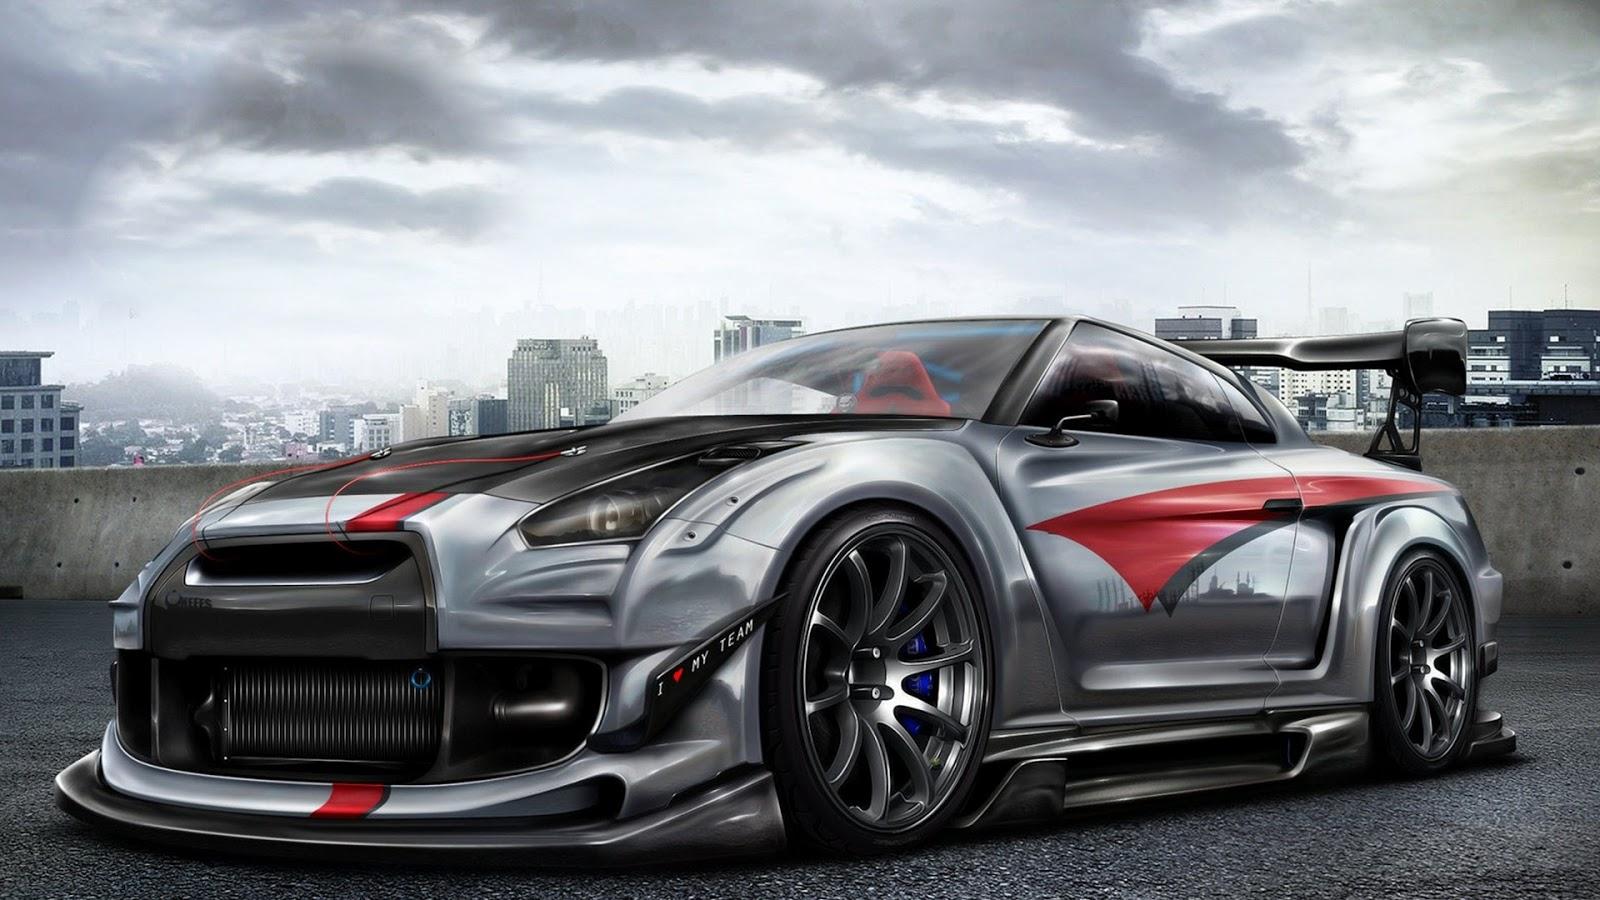 2014 Nissan Skyline GTR R35